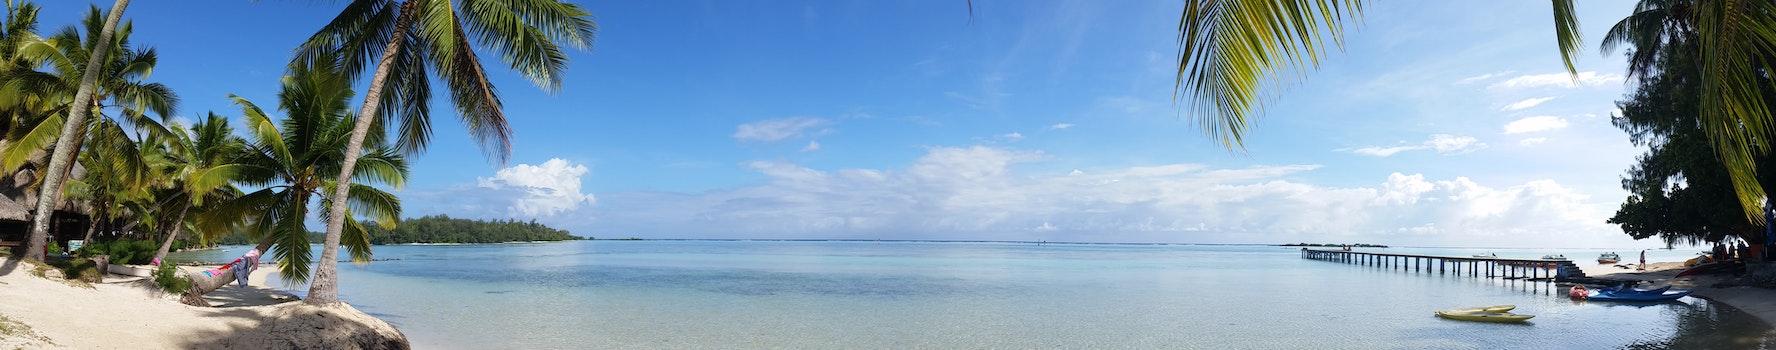 Coconut Trees Near Ocean and Dock